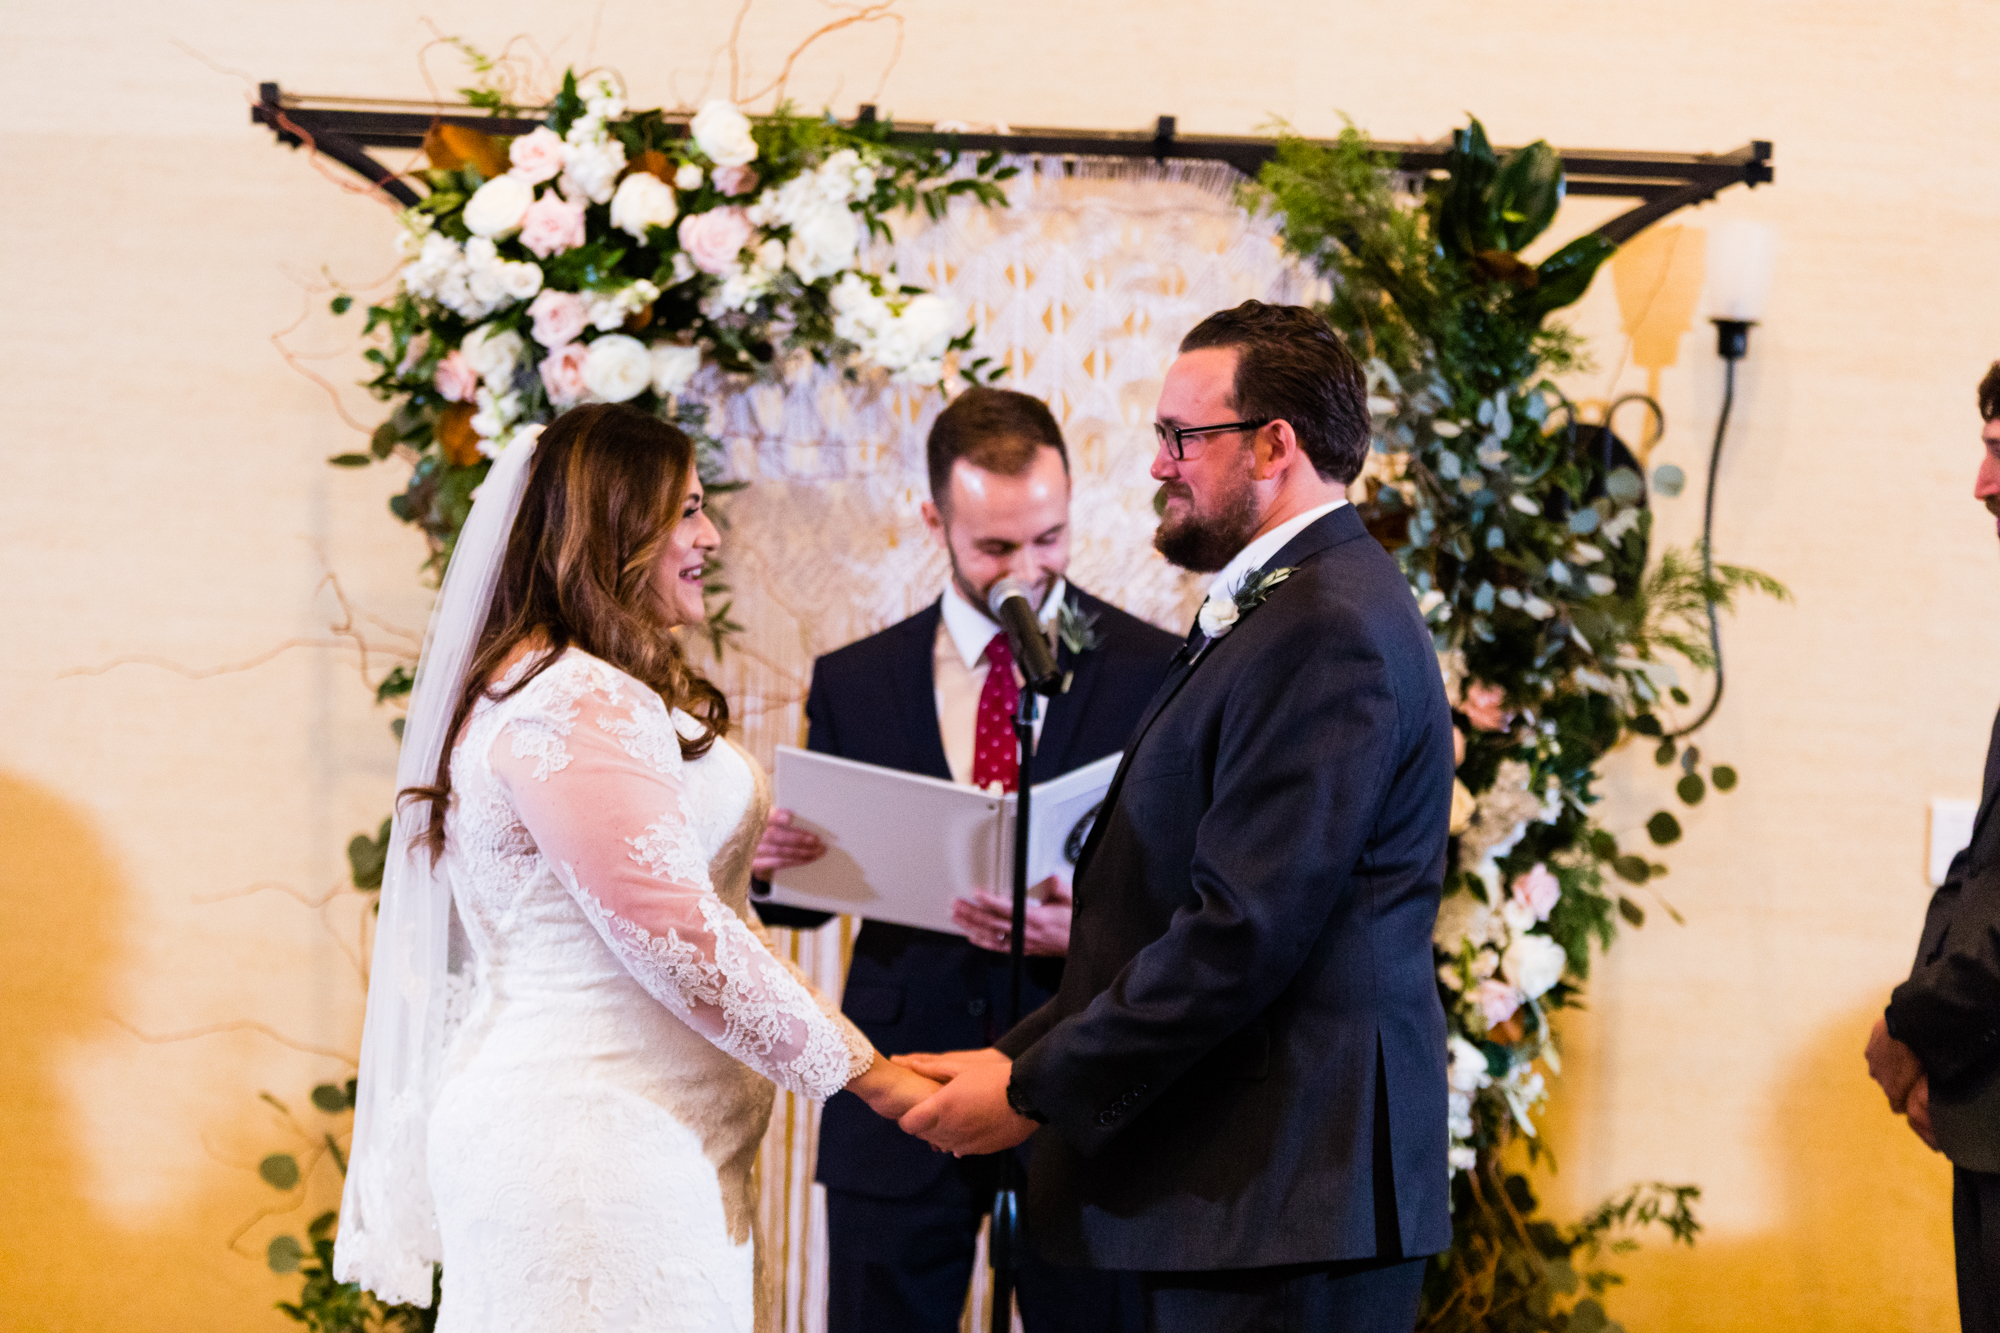 Bear Creek Mountain Resort Wedding Photography - Lovestruck Pictures-073.jpg